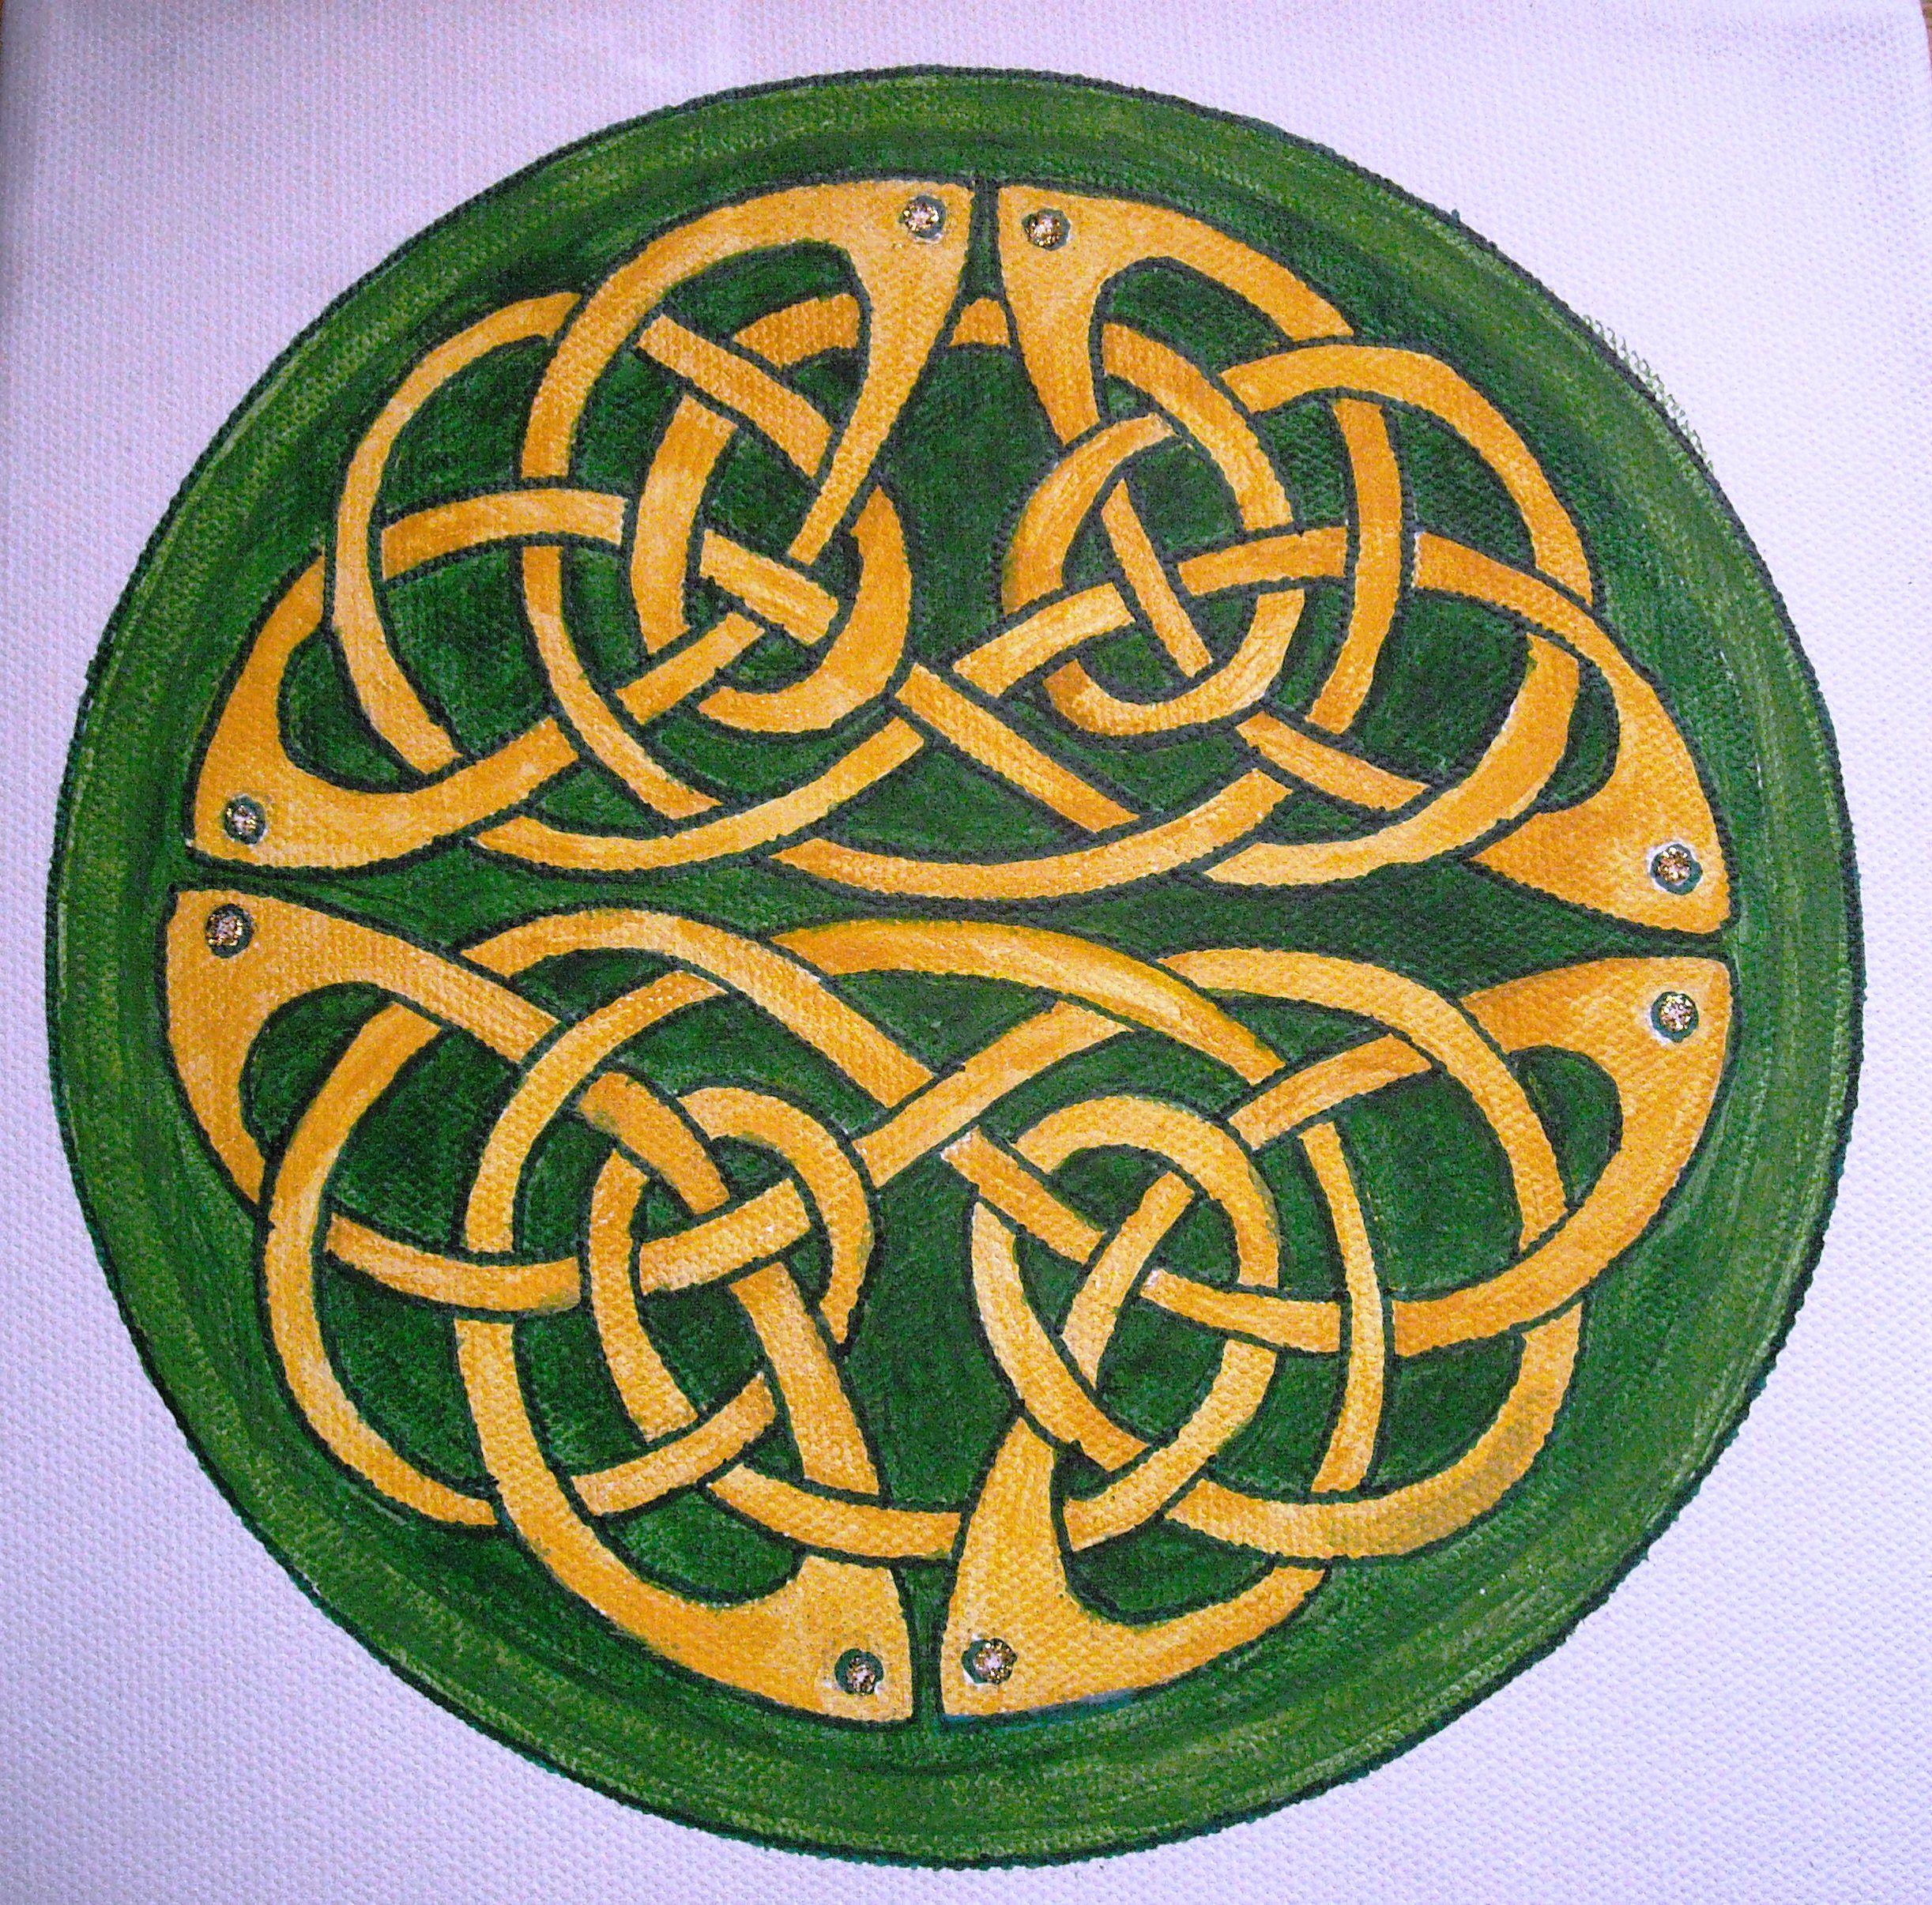 celtic knot   celtic creations   Pinterest   Nudos celtas, Celta y Nudo